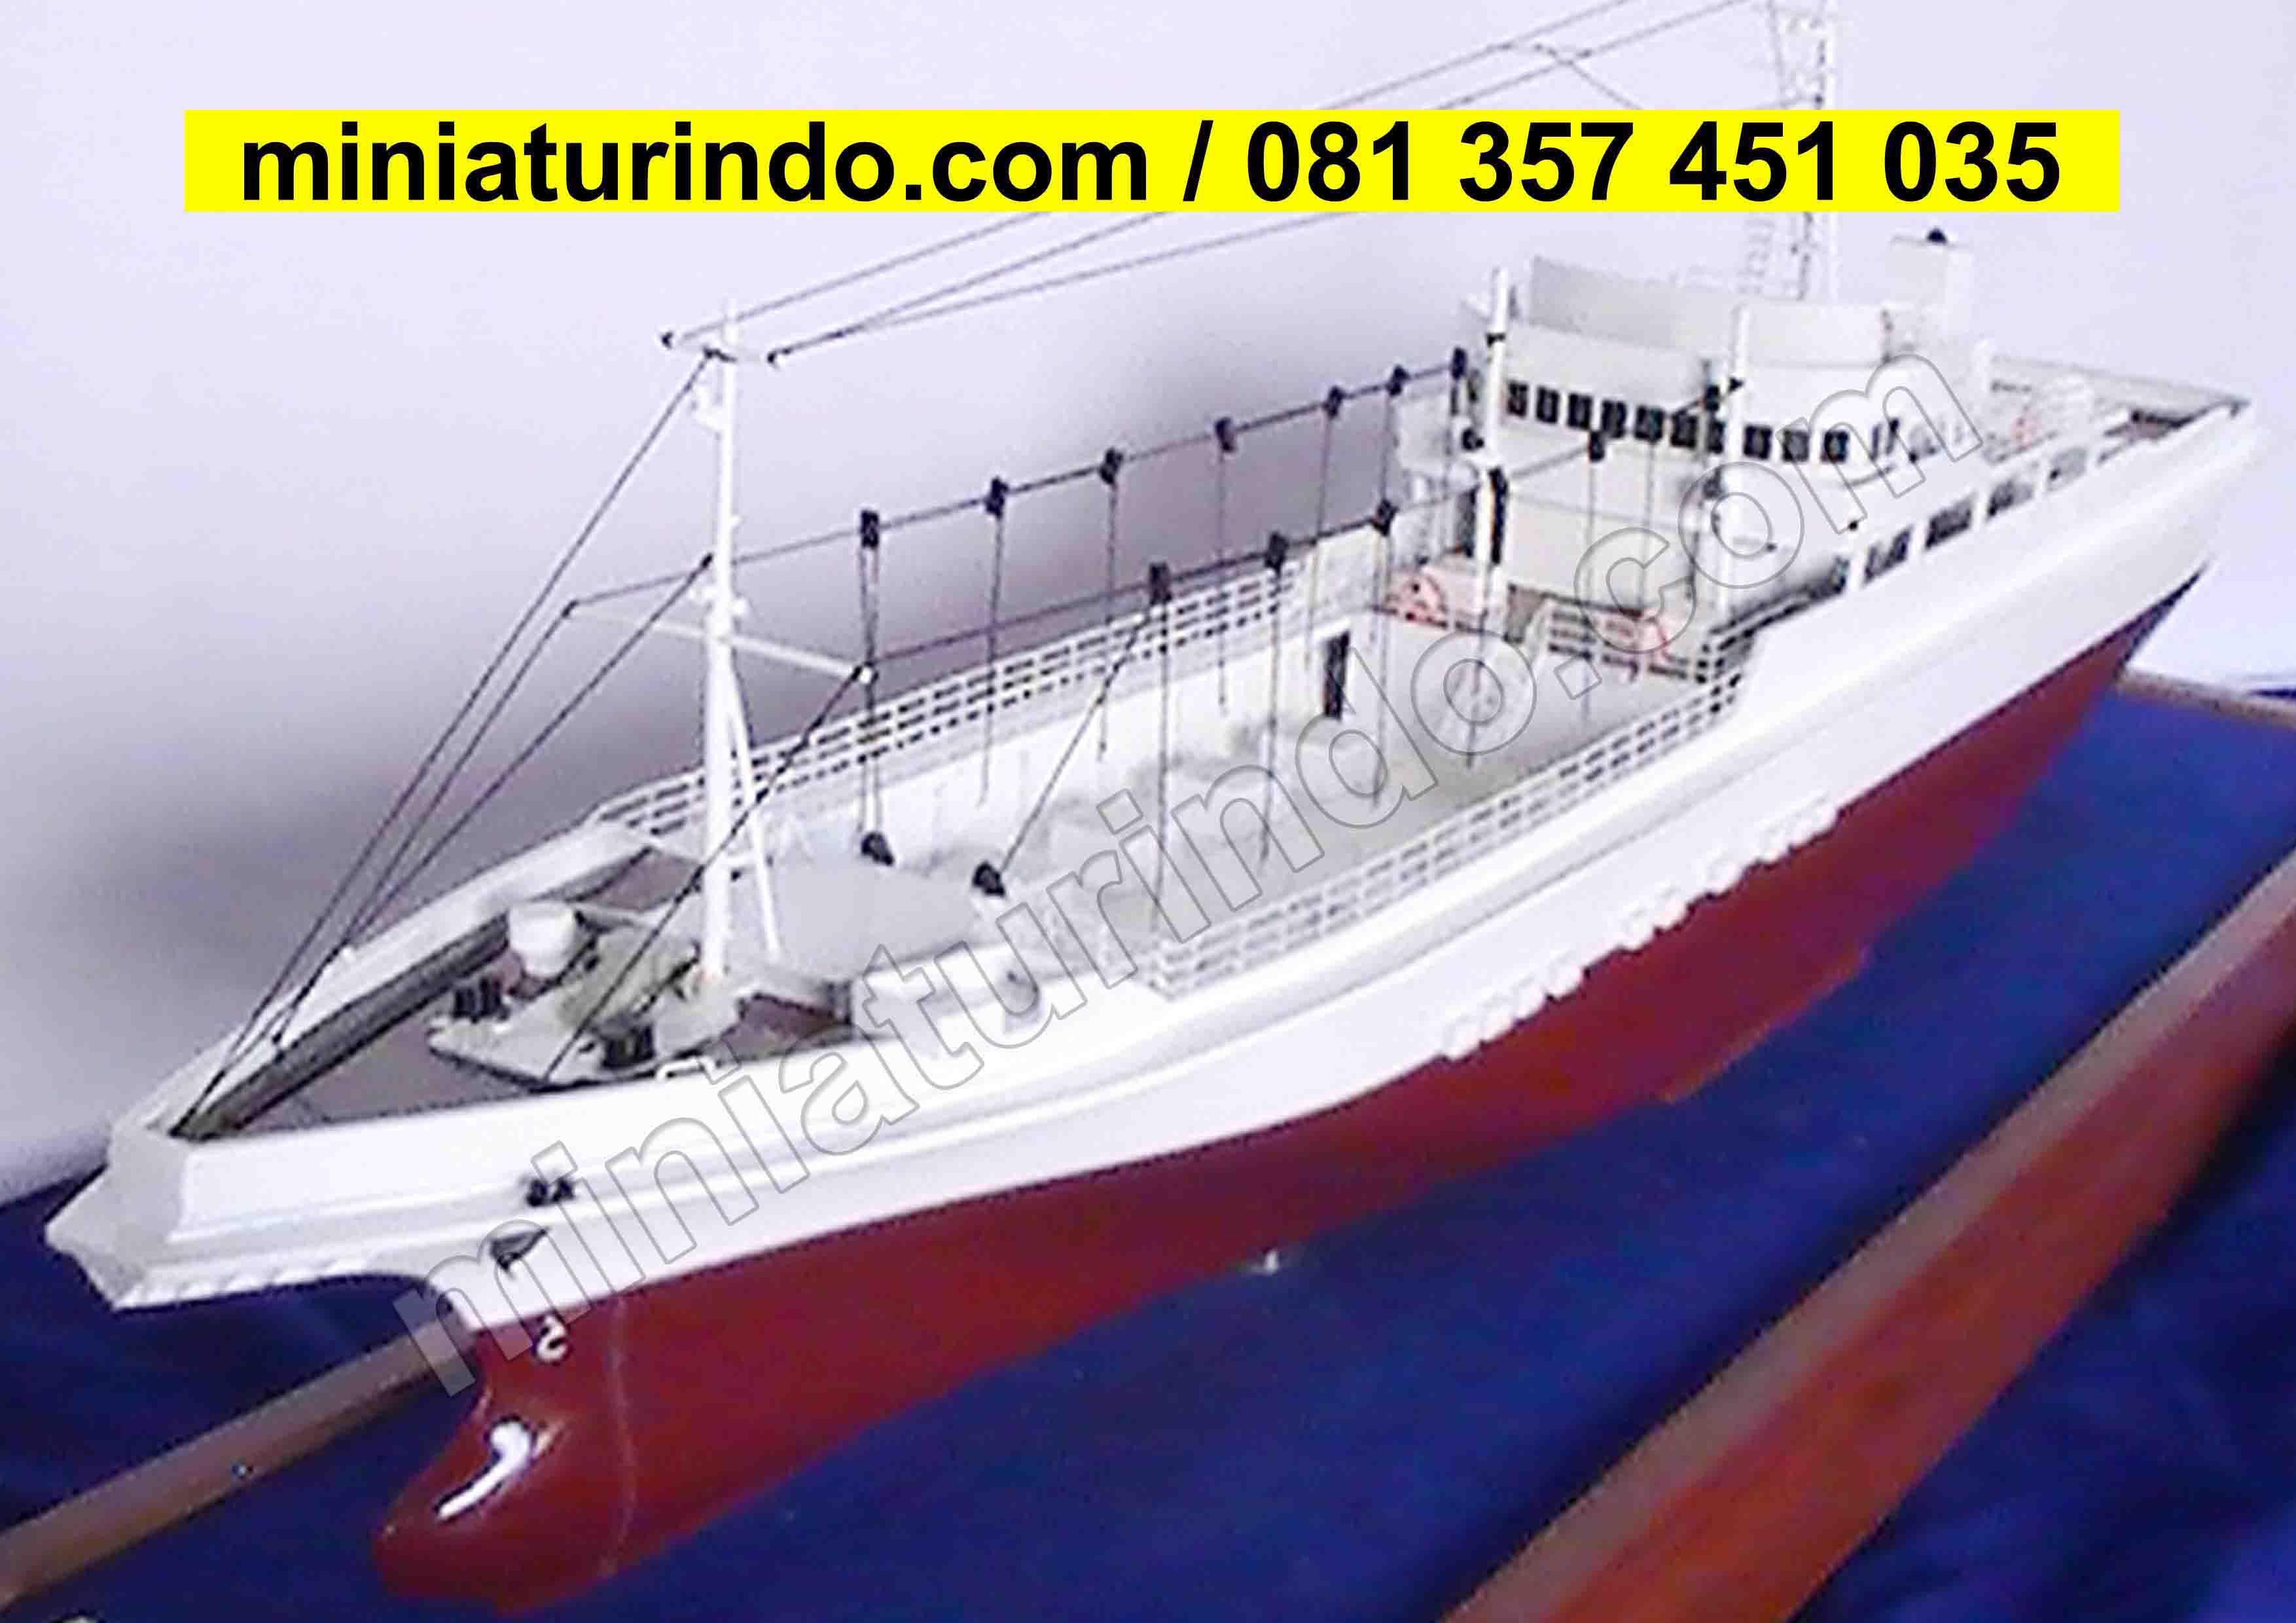 Cara Membuat Miniatur Kapal Perangcara Membuat Perahu Mainan Dari